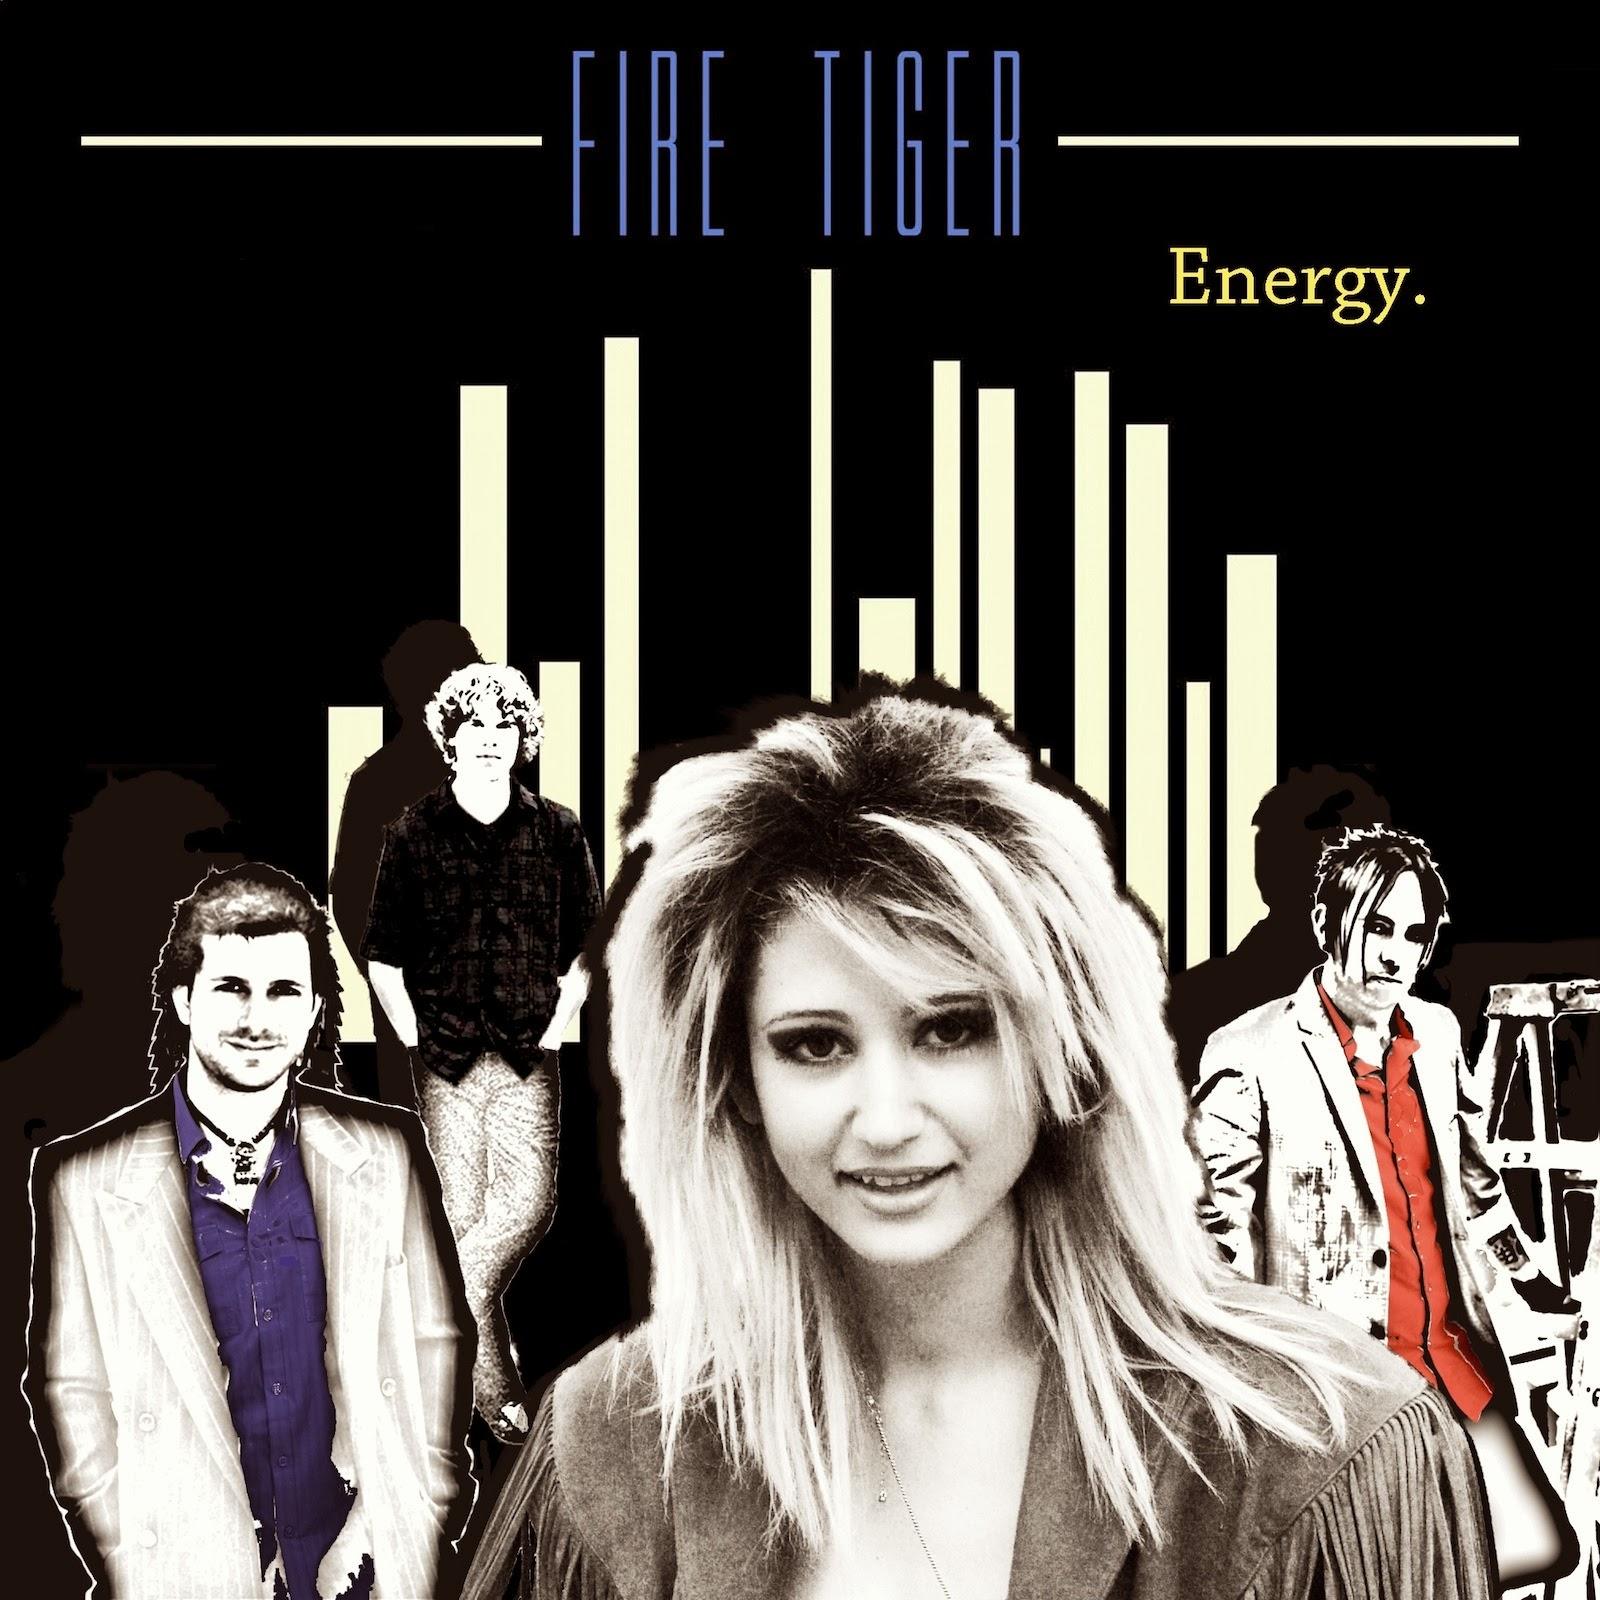 Fire-Tiger-Energy-Cover-2.jpg